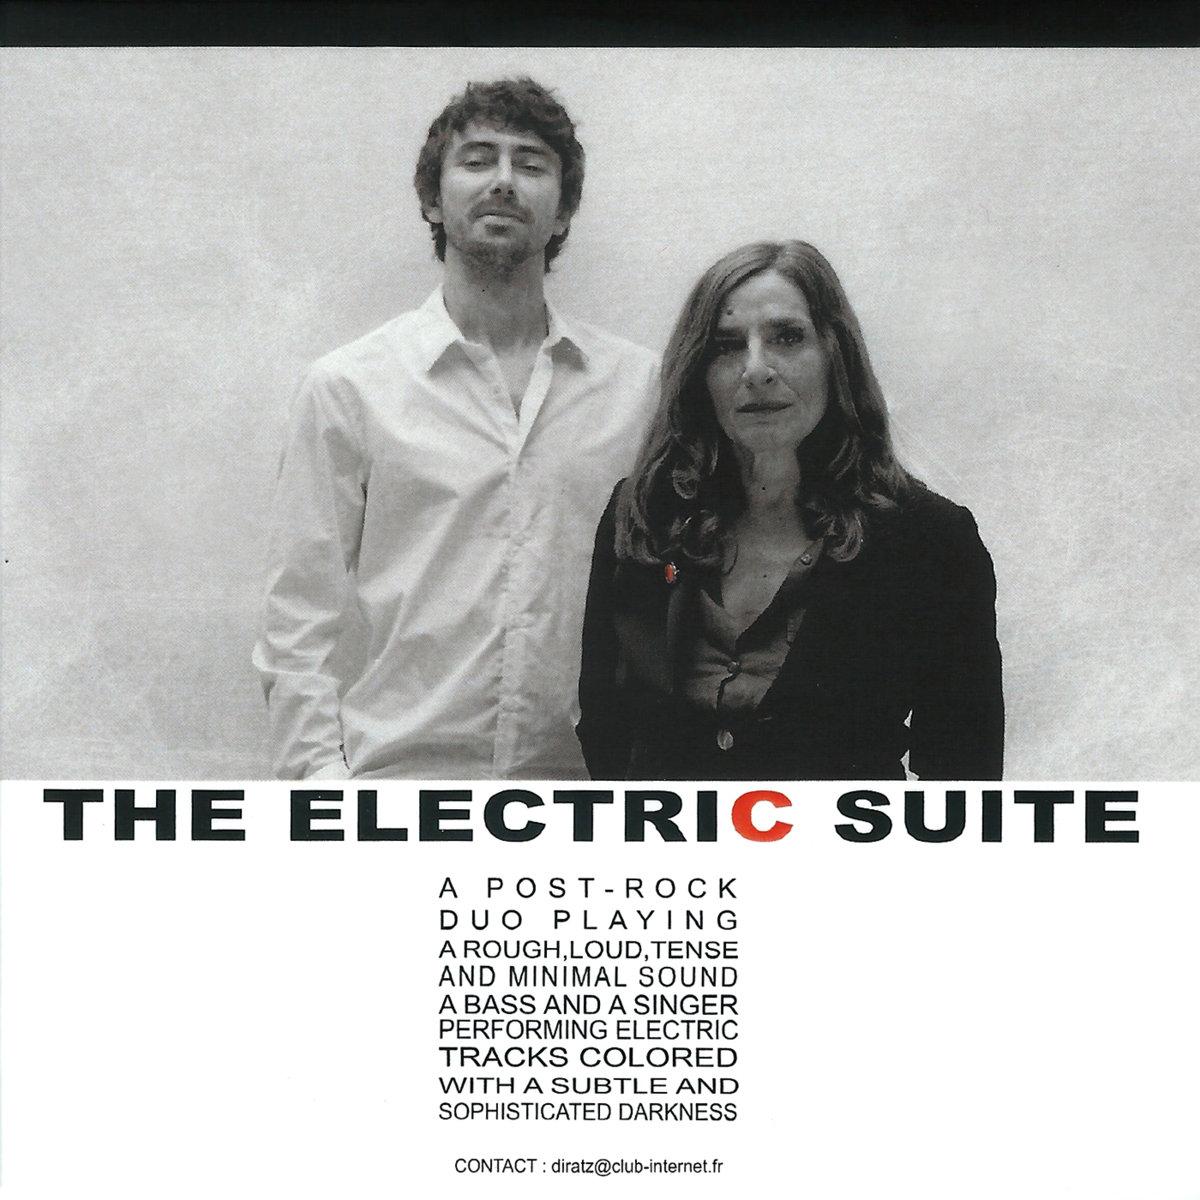 Carla Diratz & Corentin Coupe — The Electric Suite